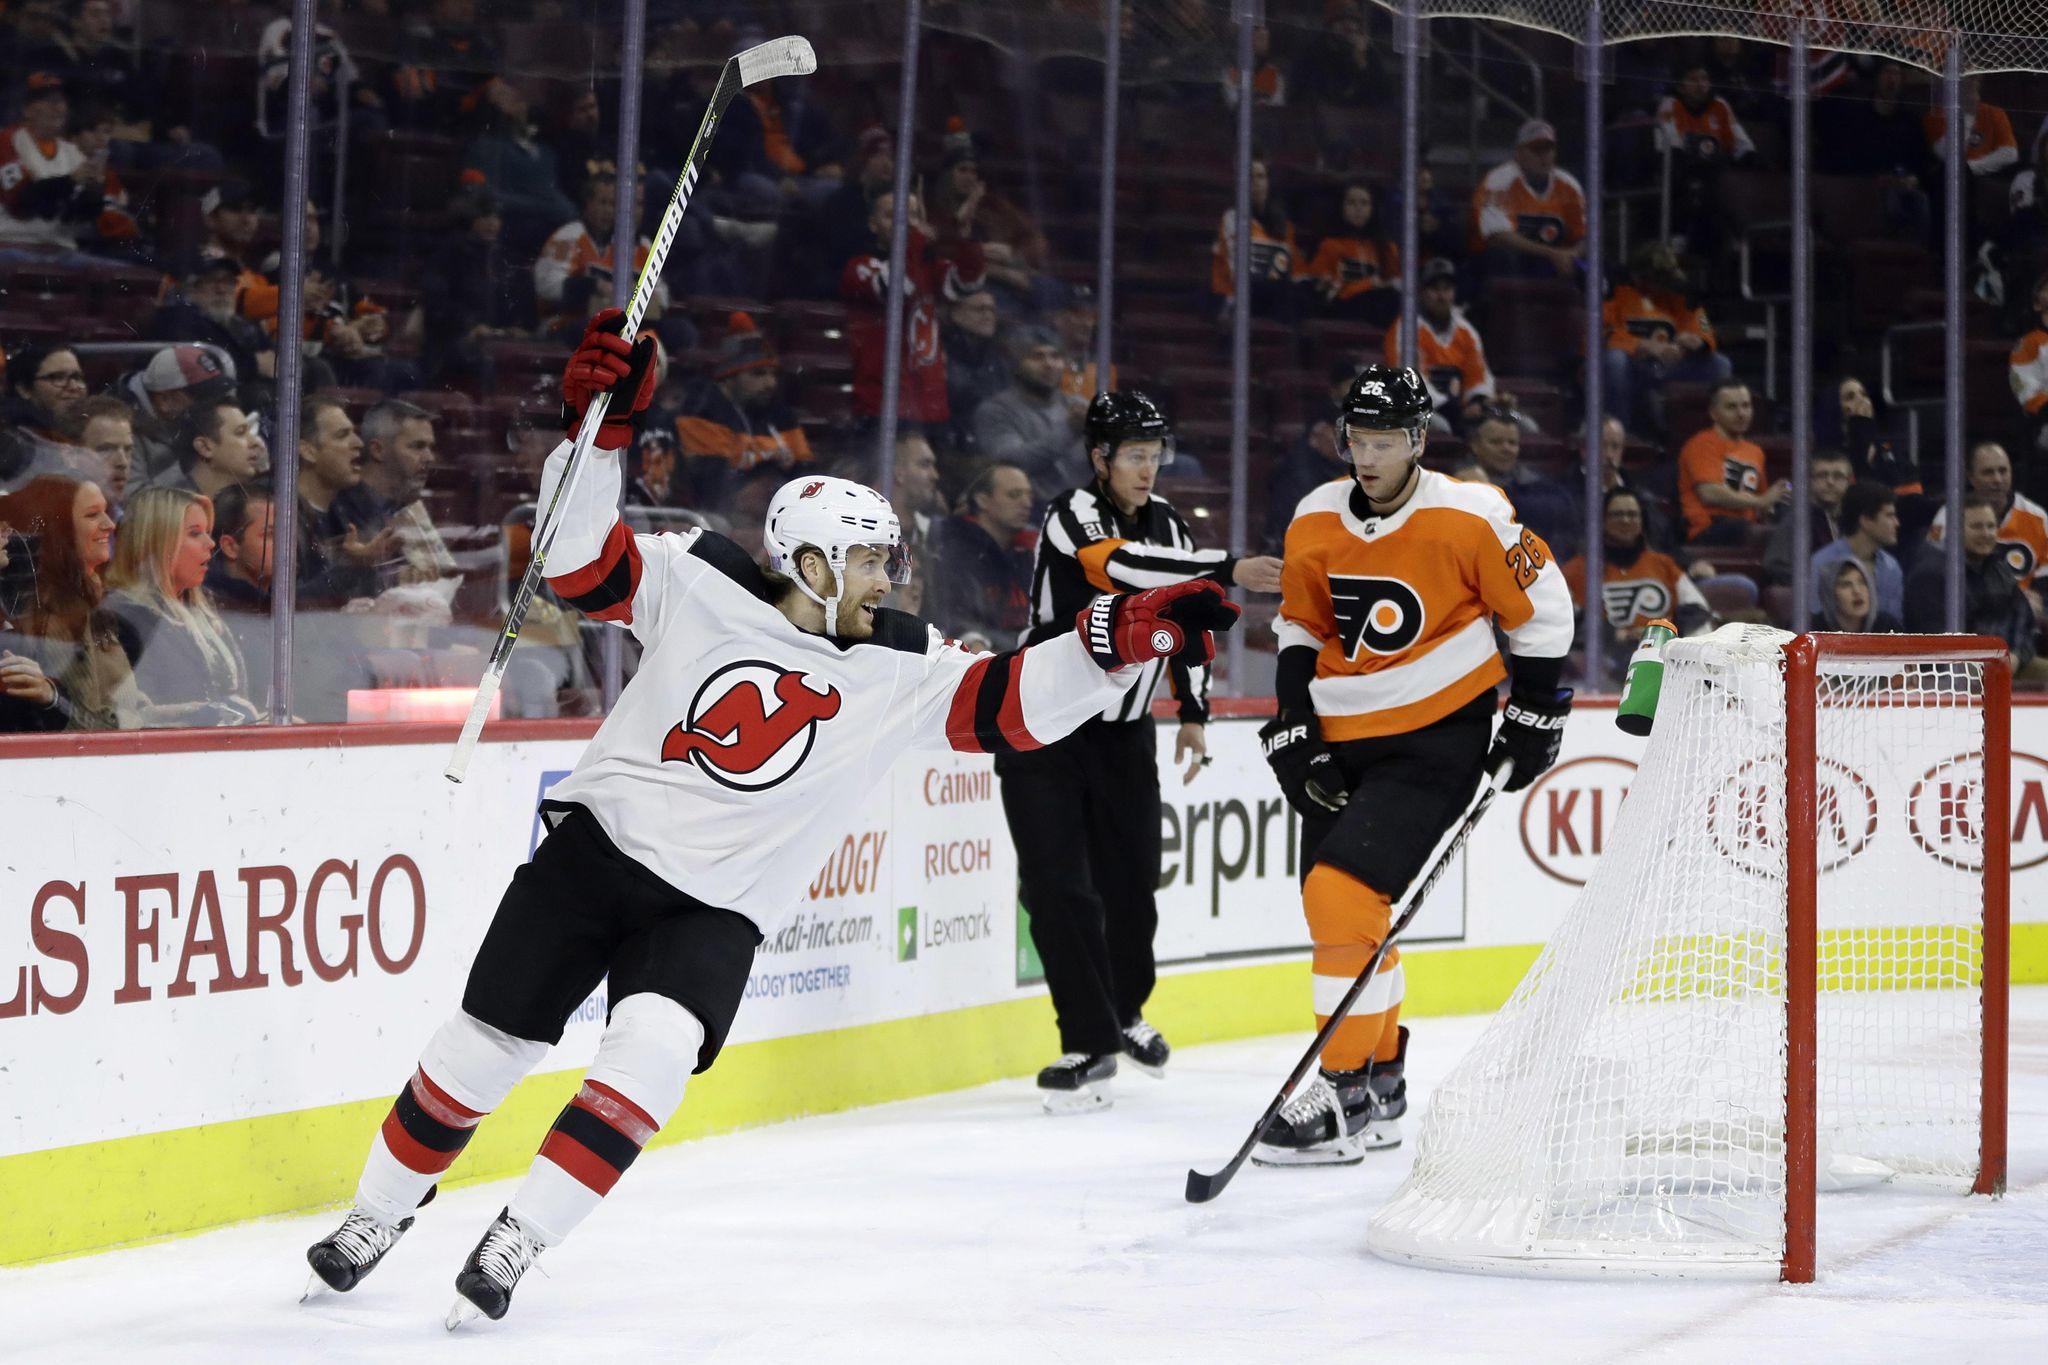 Devils_flyers_hockey_62367_s2048x1365